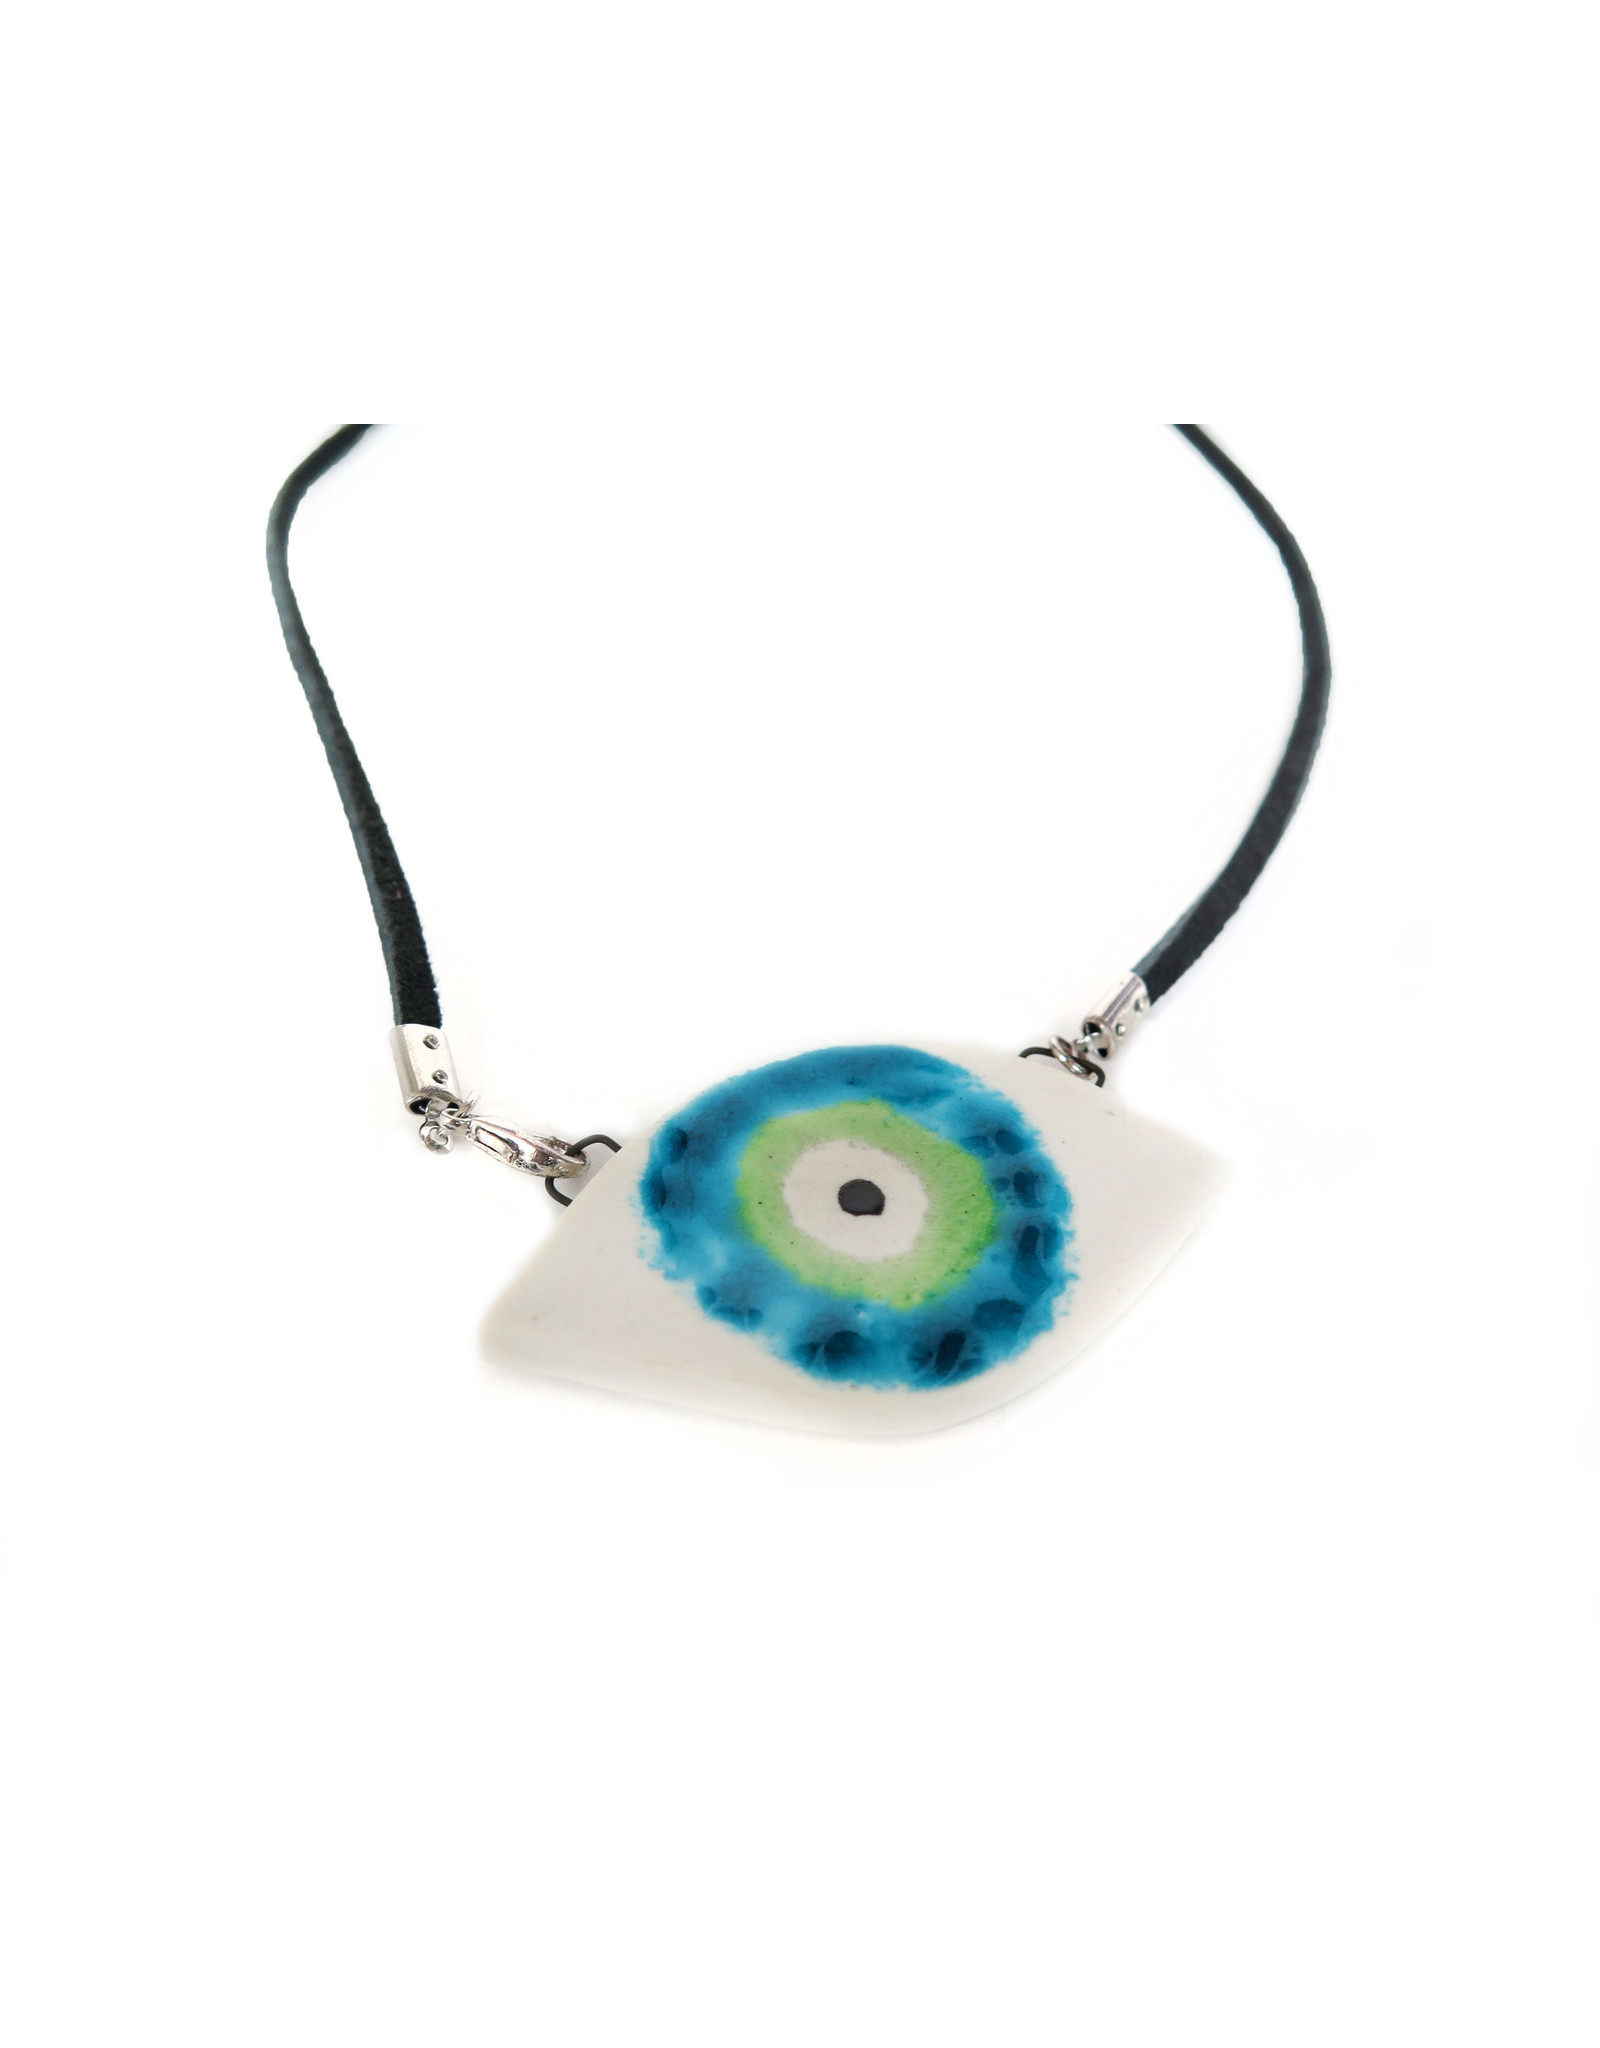 Green/Aqua Porcelain Evil Eye Necklace, Larissa Rolley